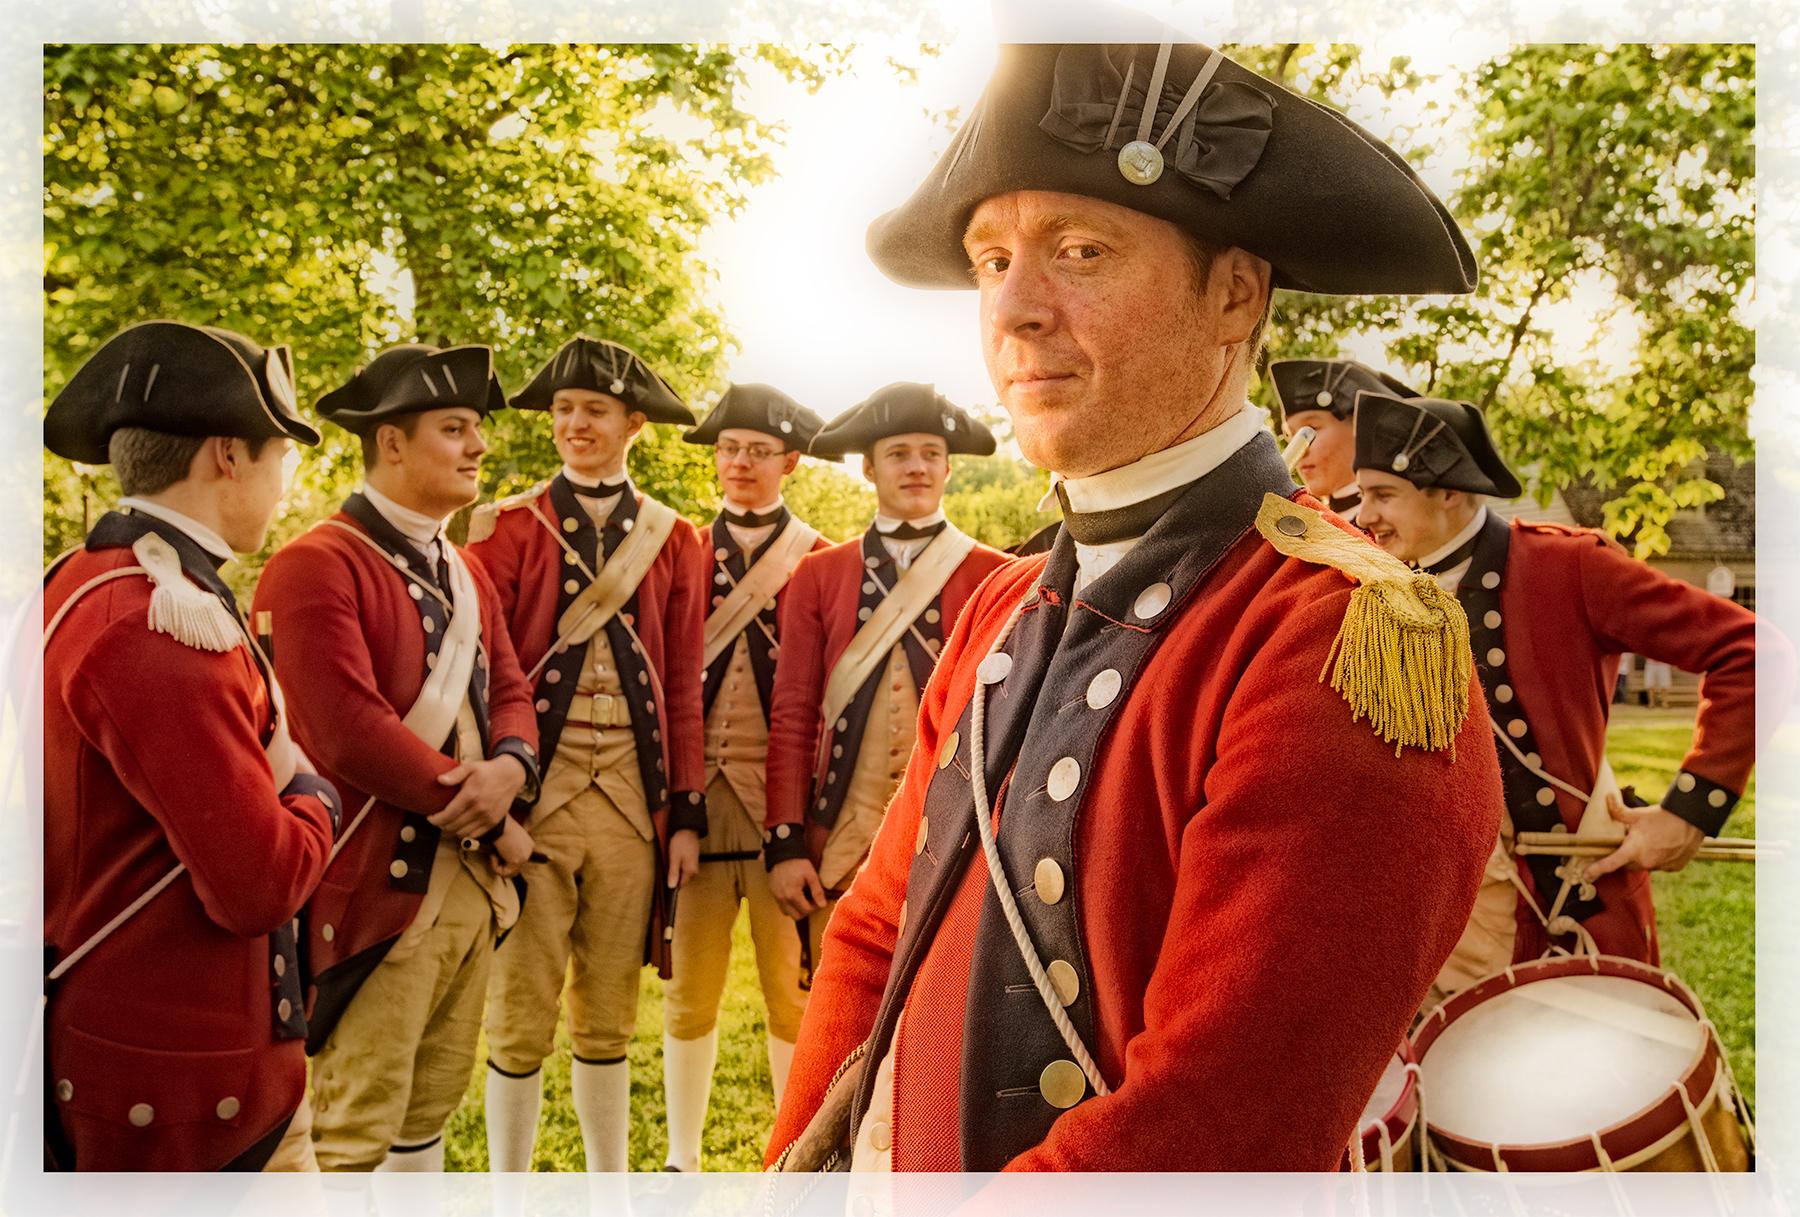 Colonial Williamsburg for Virginia Tourism